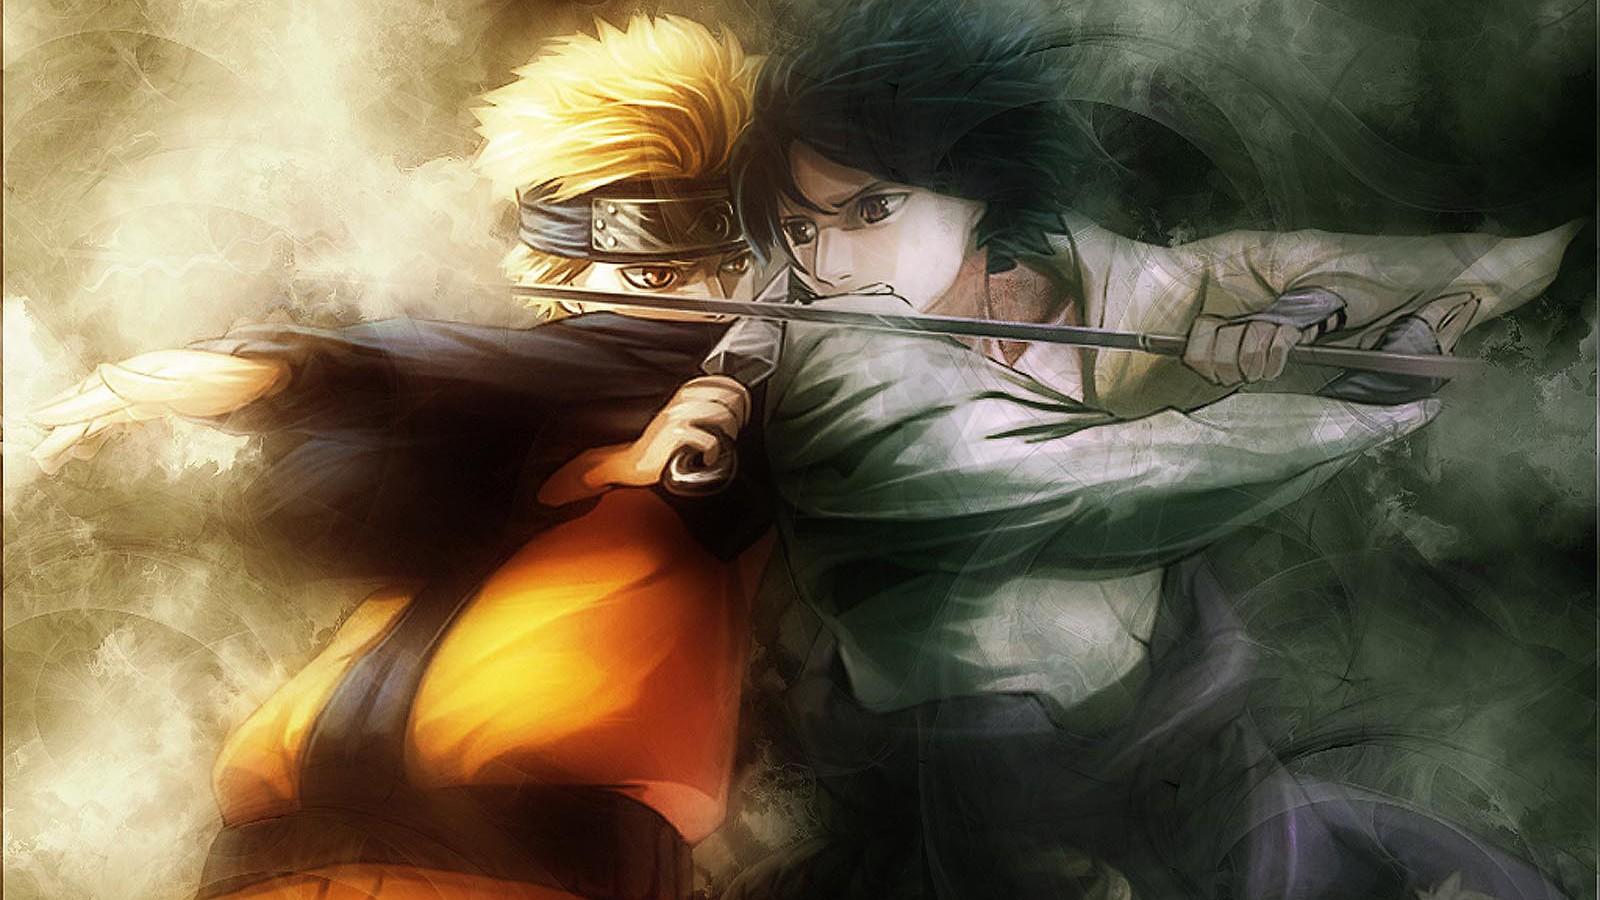 Anime Boys Naruto Shippuuden Uzumaki Uchiha Sasuke Person Mythology Darkness Screenshot Computer Wallpaper Woman